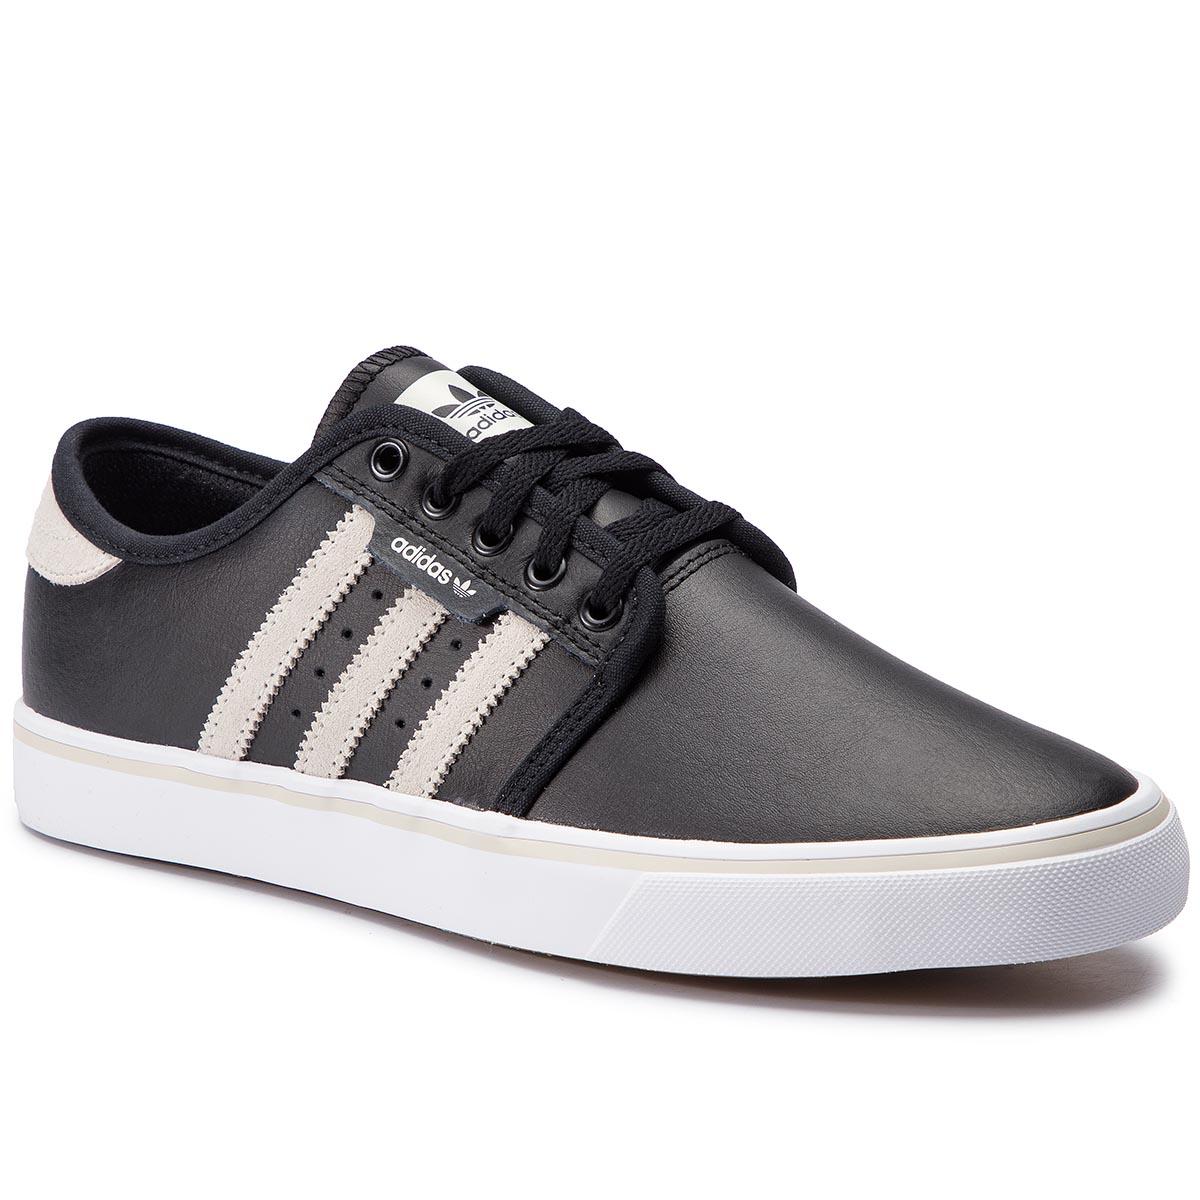 29e13257 Shoes adidas - adi-ease BY4027 Cblack/Cblack/Cblack - Sneakers - Low ...